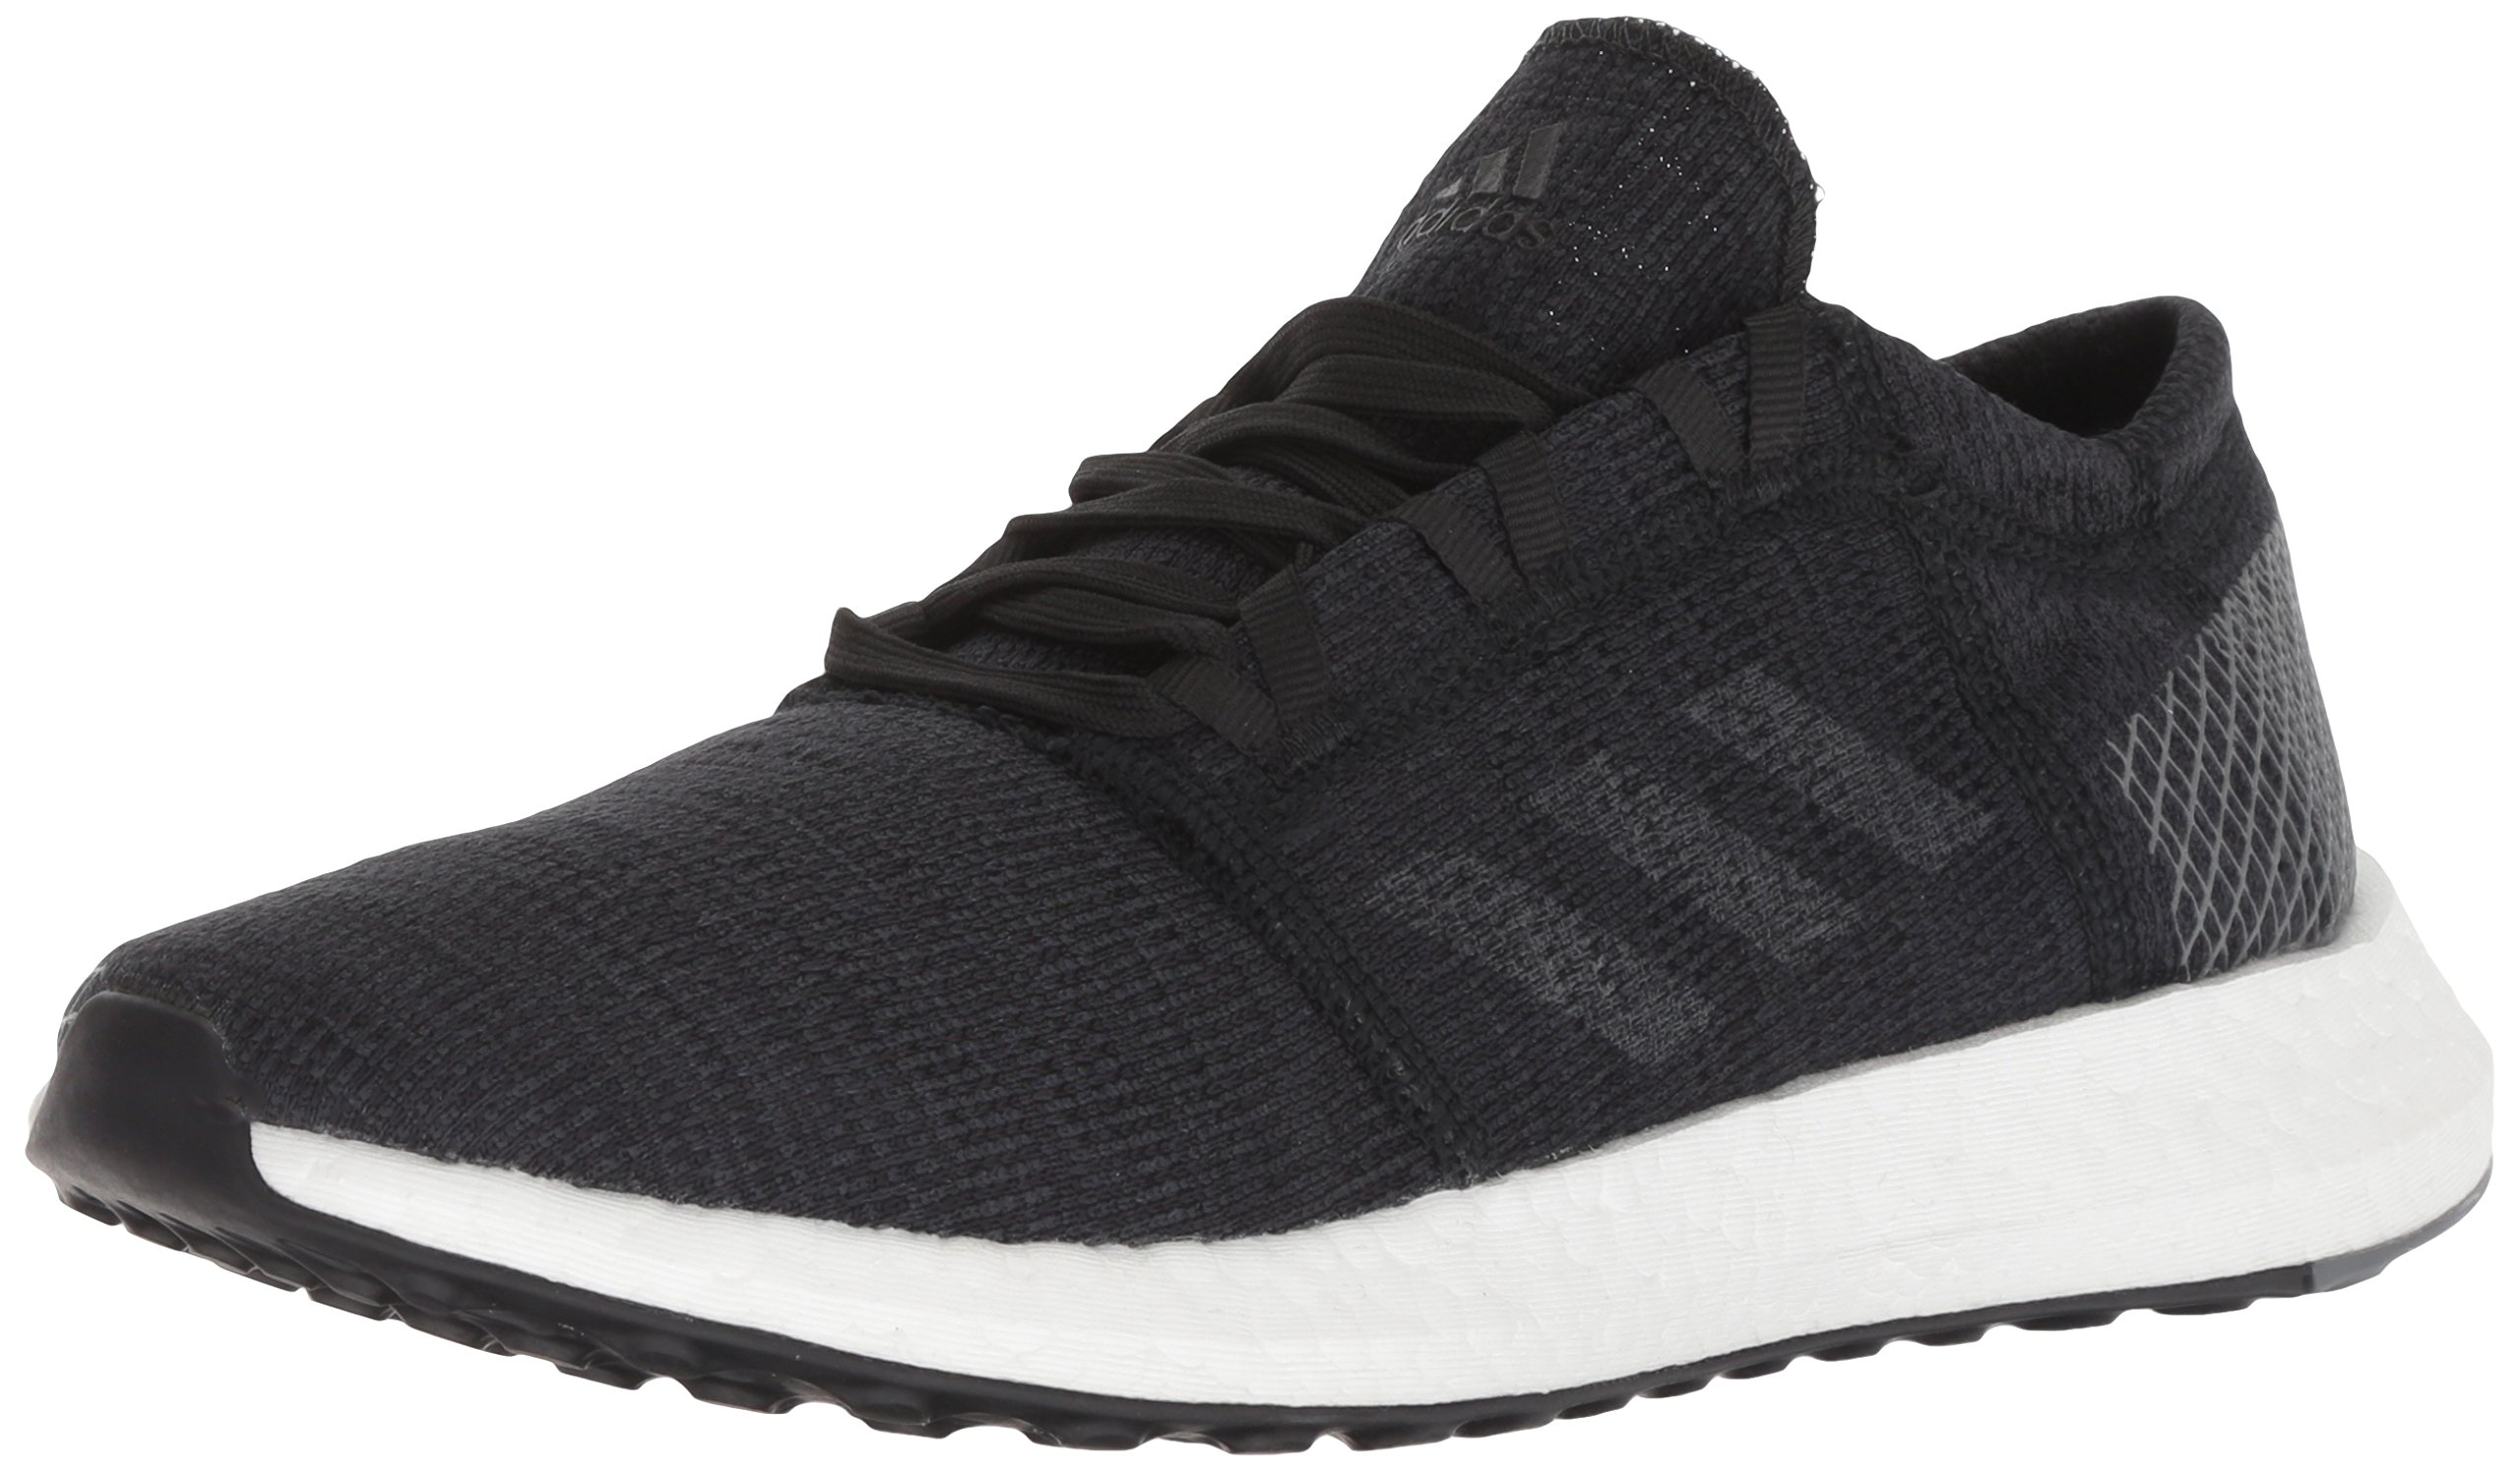 adidas Women's Pureboost Go Running Shoe, Black/Grey/Grey, 8 M US